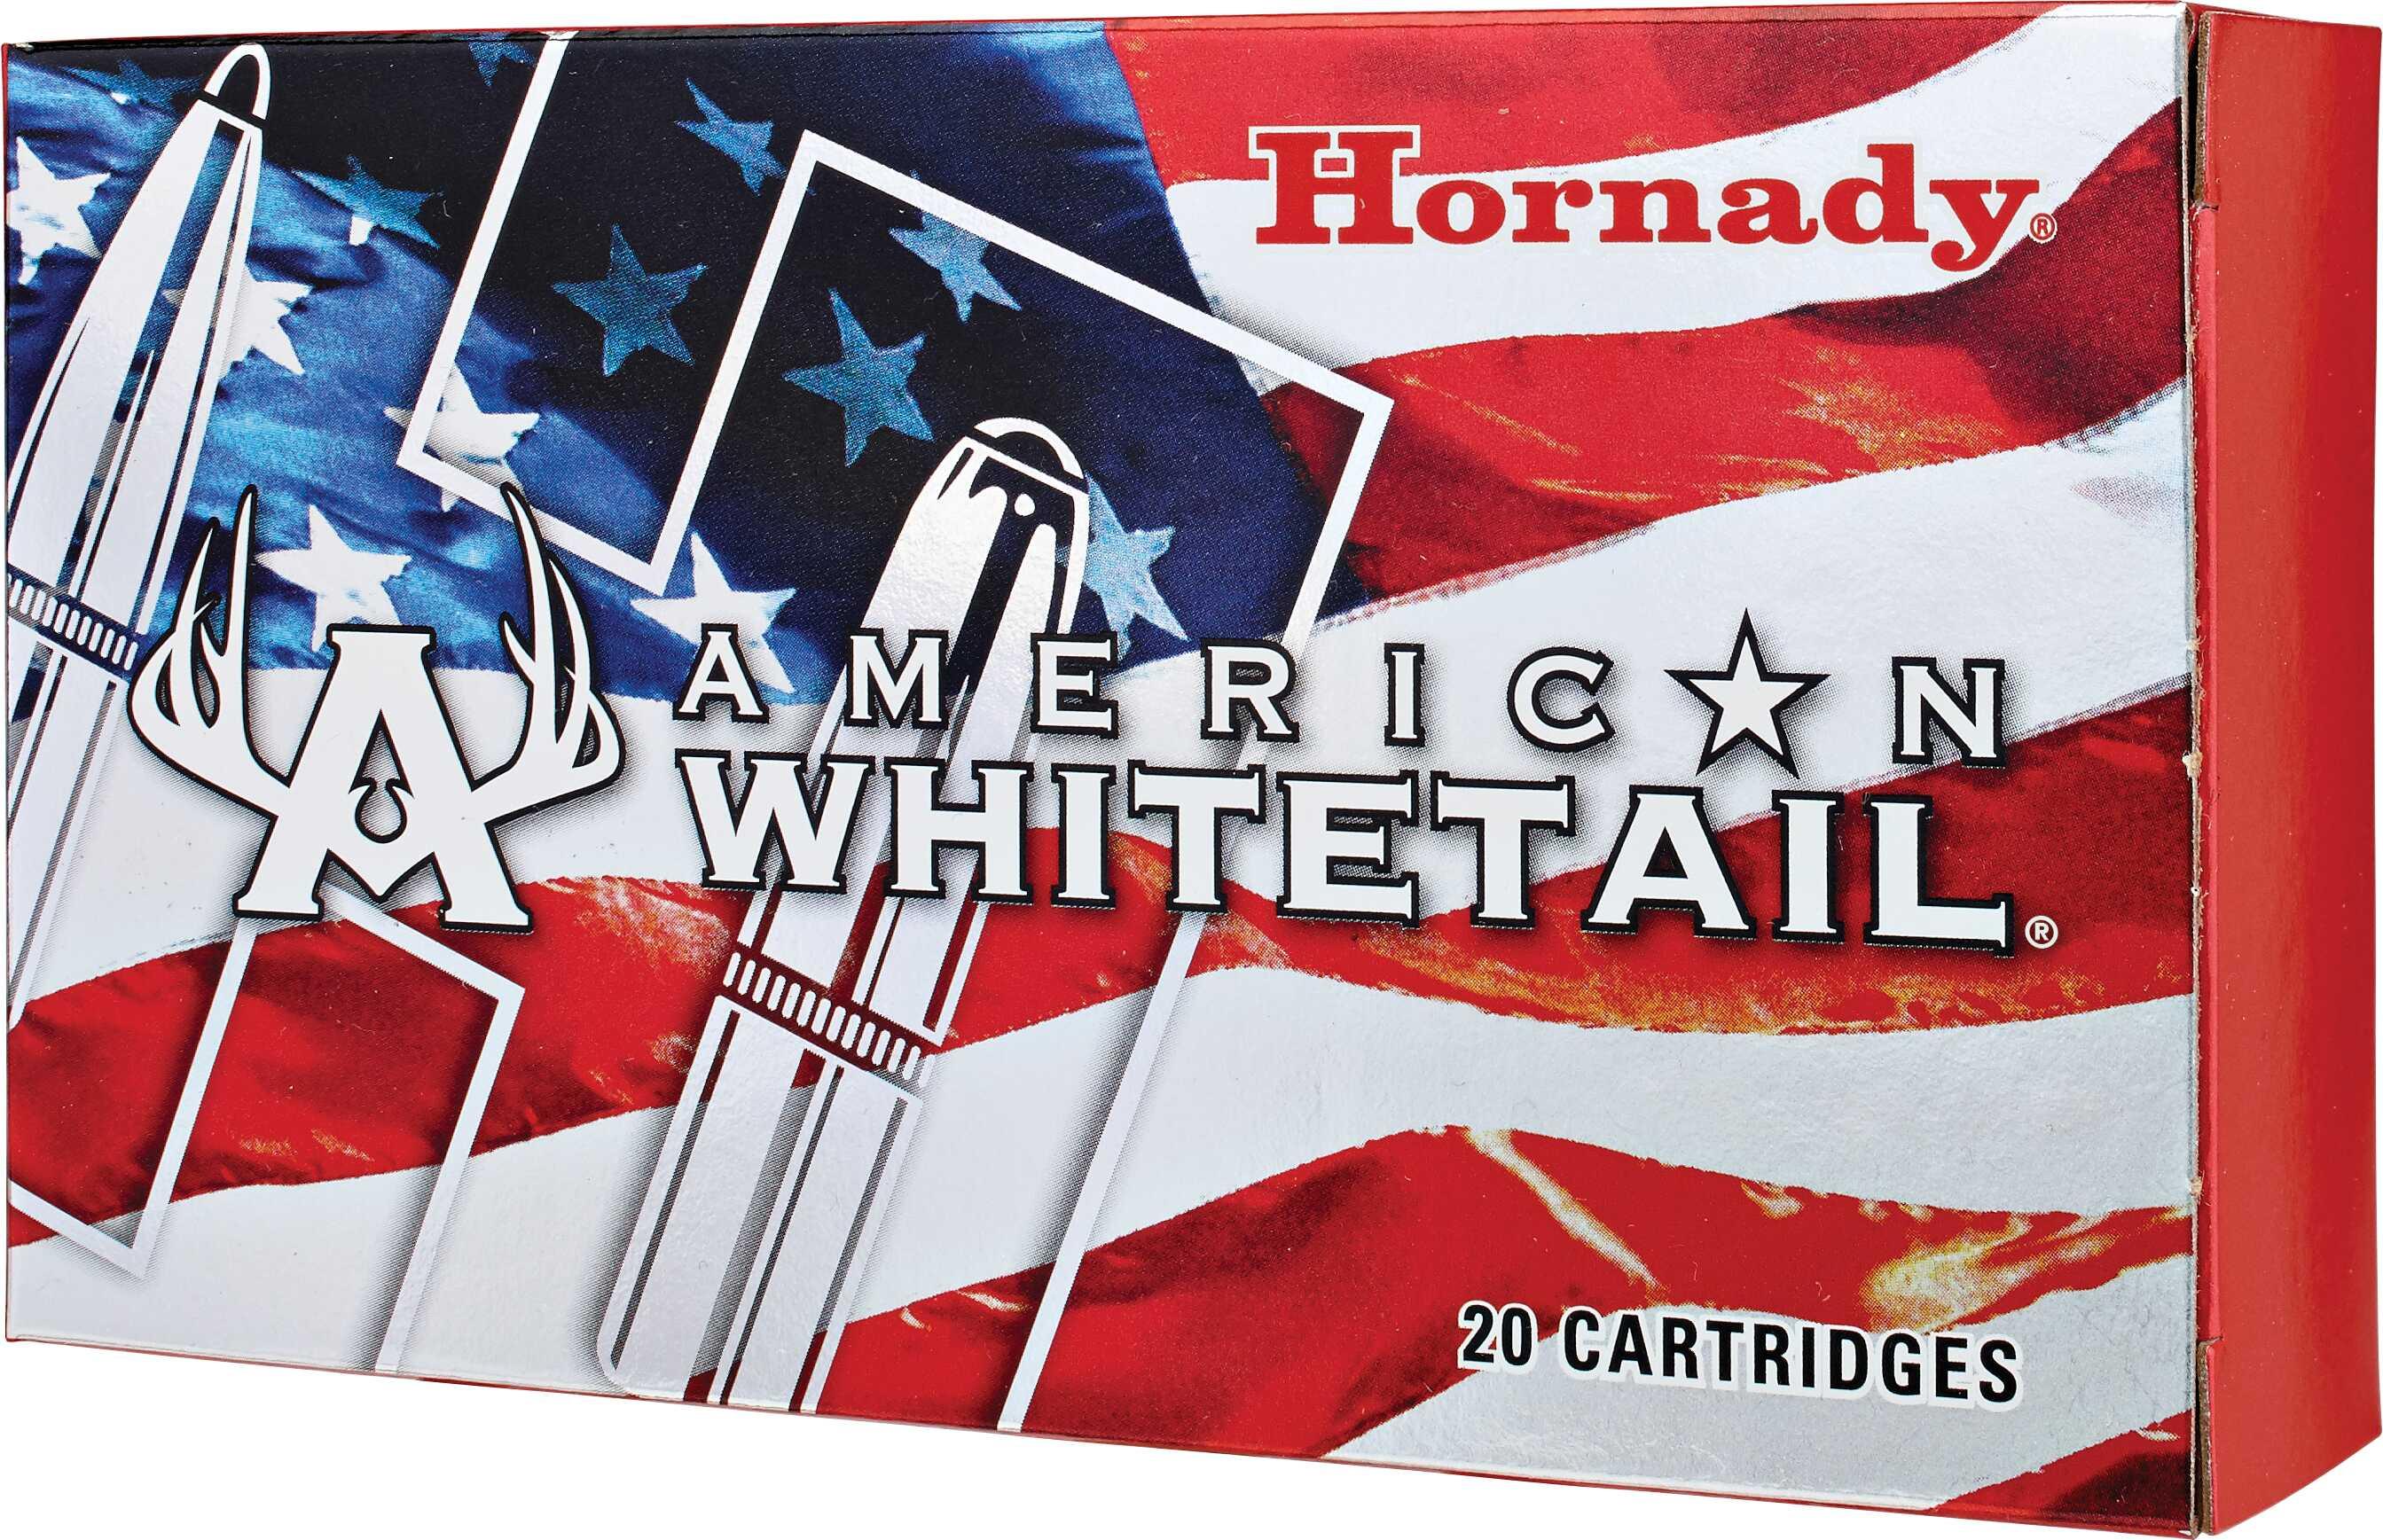 25-06 Remington By Hornady American Whitetail 117 Grain BTSP (Per 20) Md: 8144